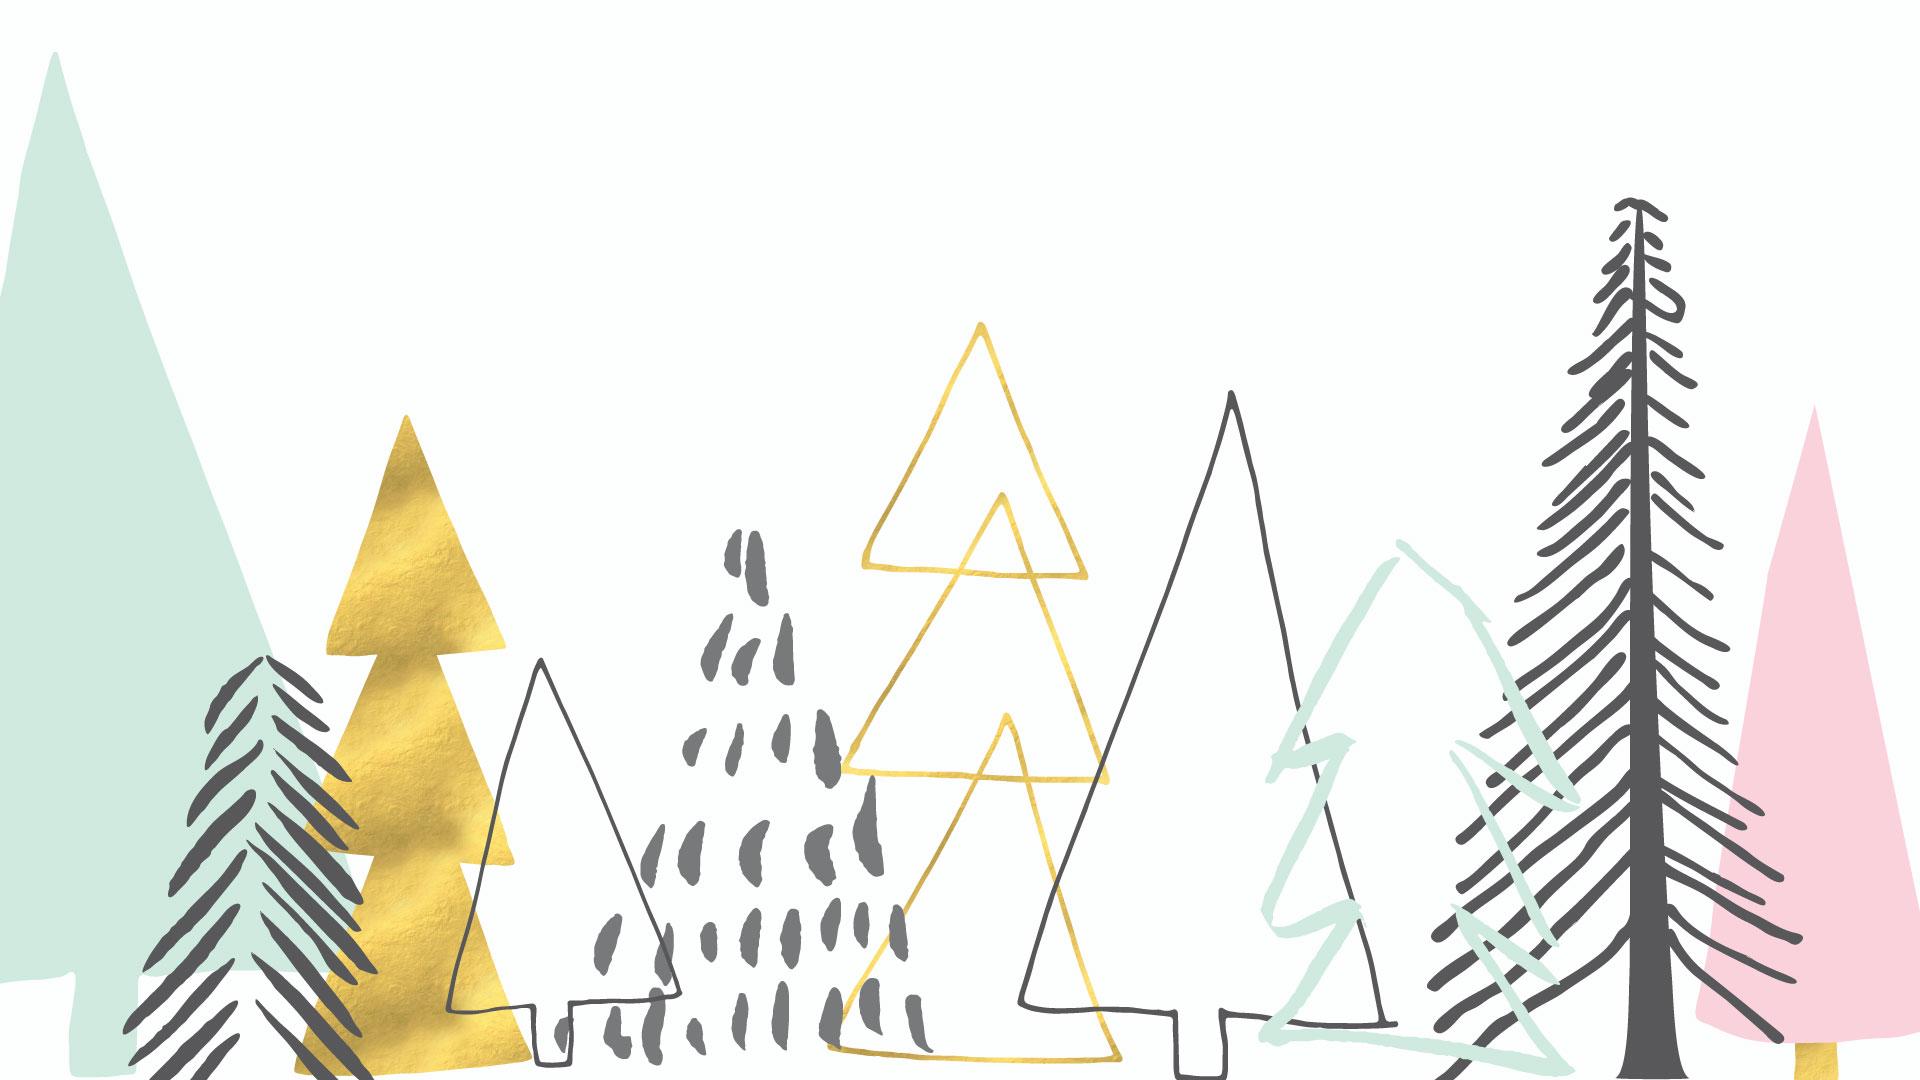 Pastel Christmas Wallpaper Desktop , HD Wallpaper & Backgrounds